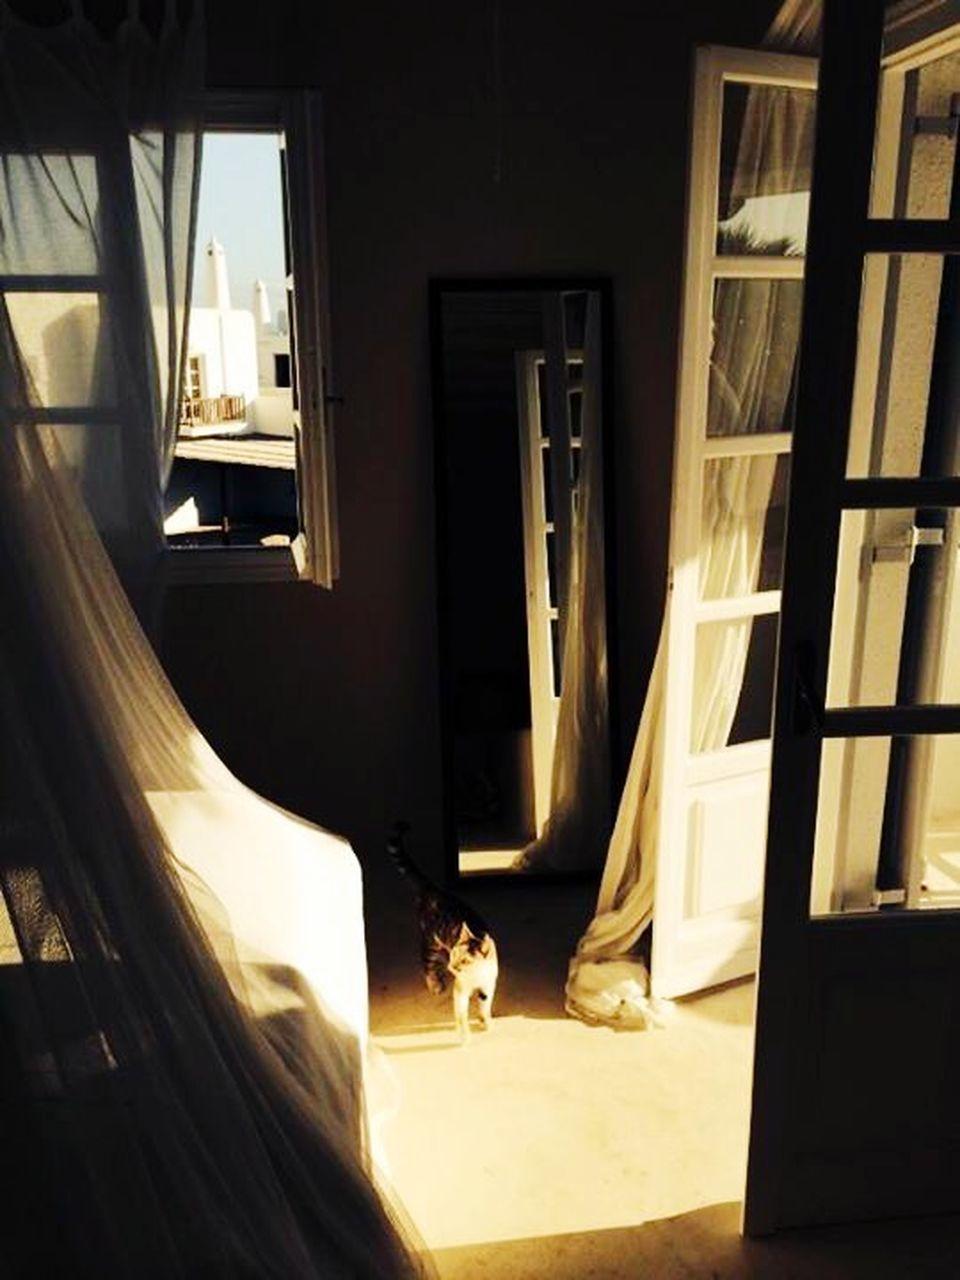 window, indoors, curtain, architecture, home interior, sunlight, no people, illuminated, day, pets, open door, animal themes, mammal